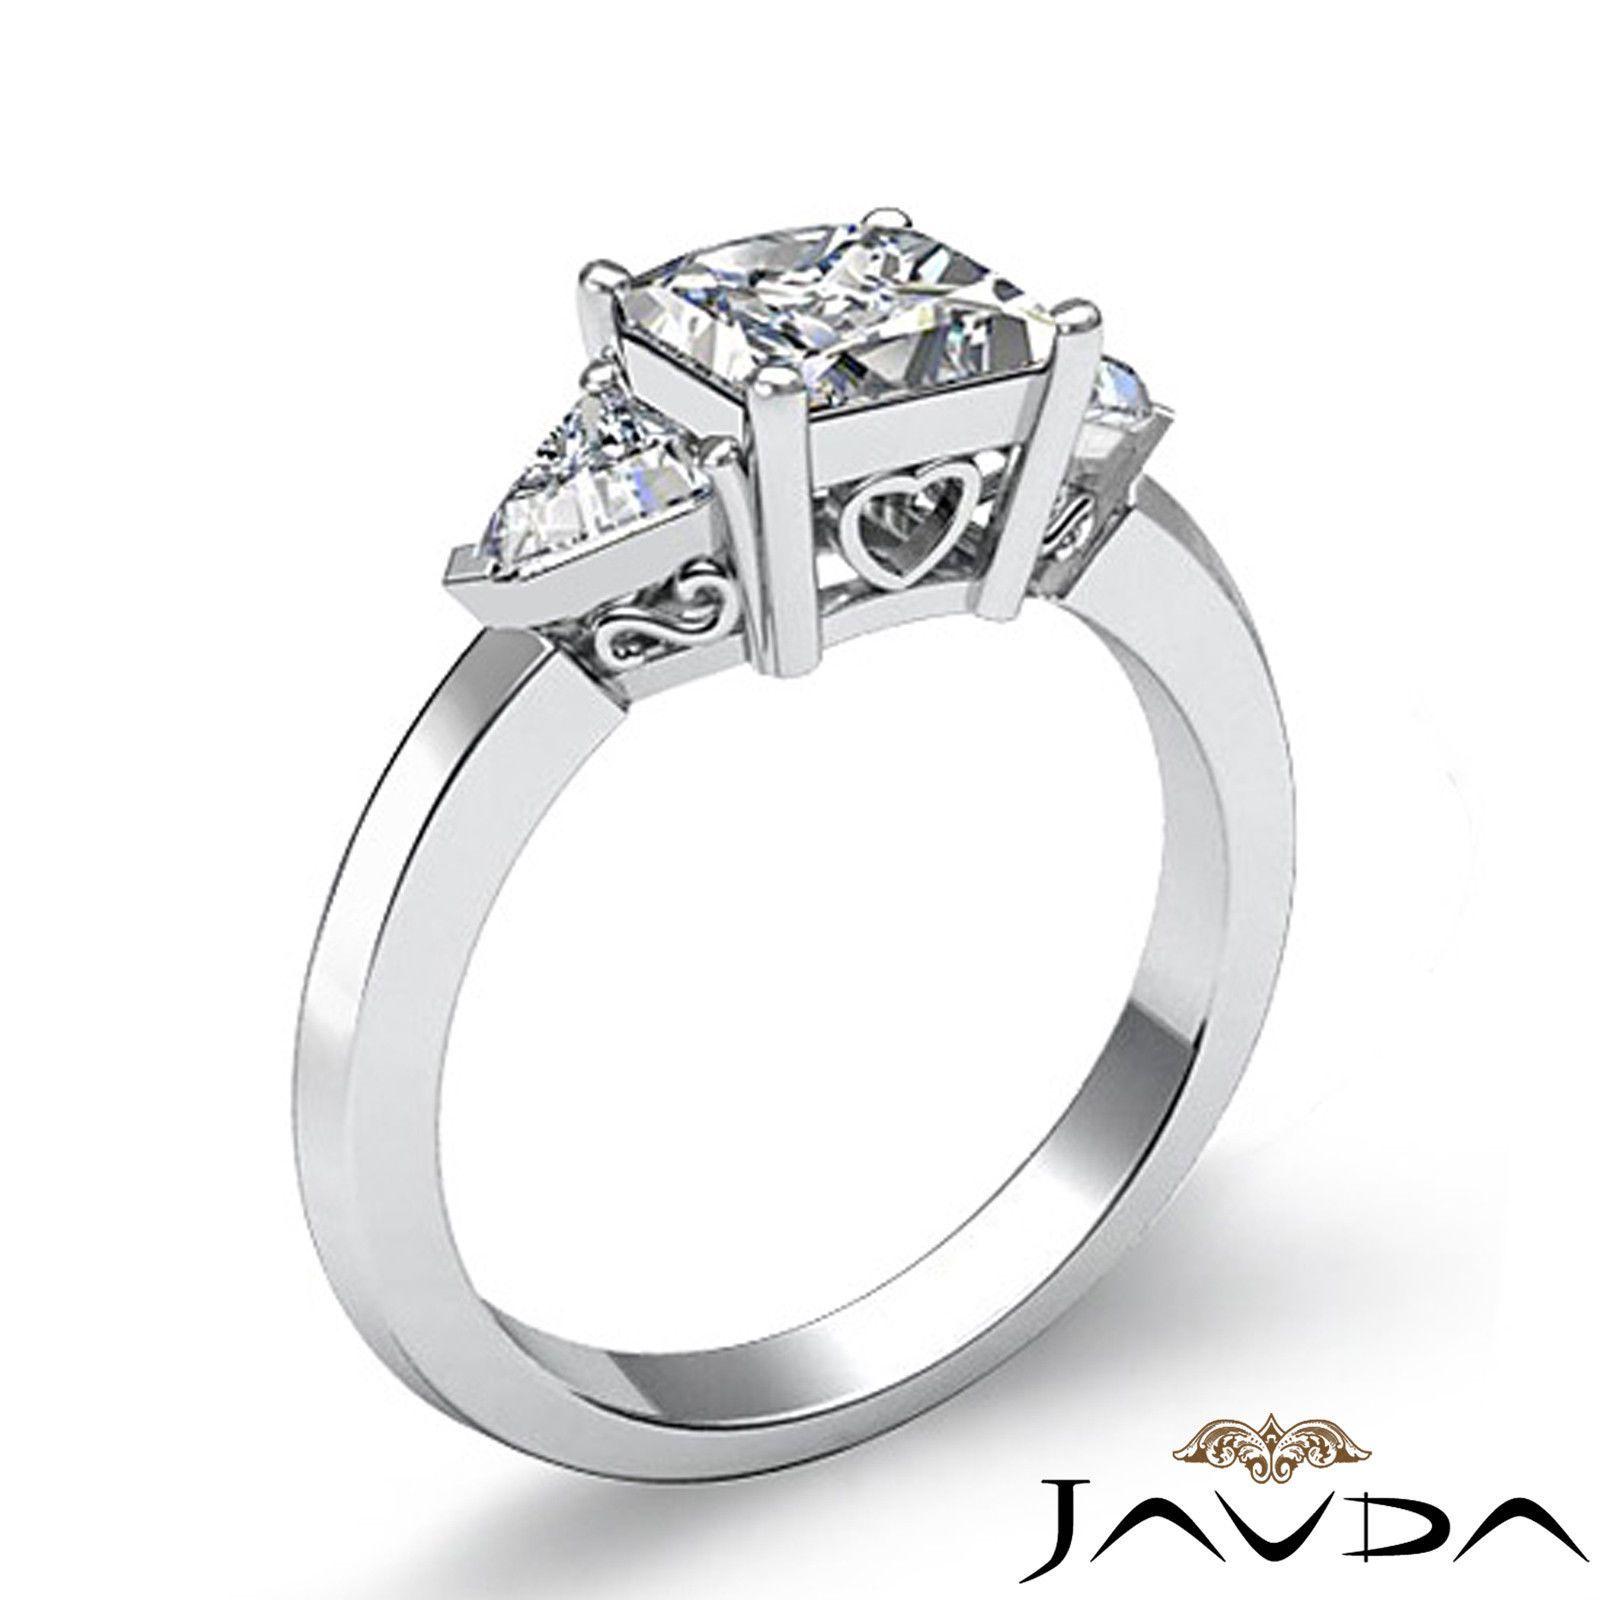 Gorgeous Princess Cut 3 Stone Diamond Engagement Ring Egl E Si1 Platinum 1  55 Ct